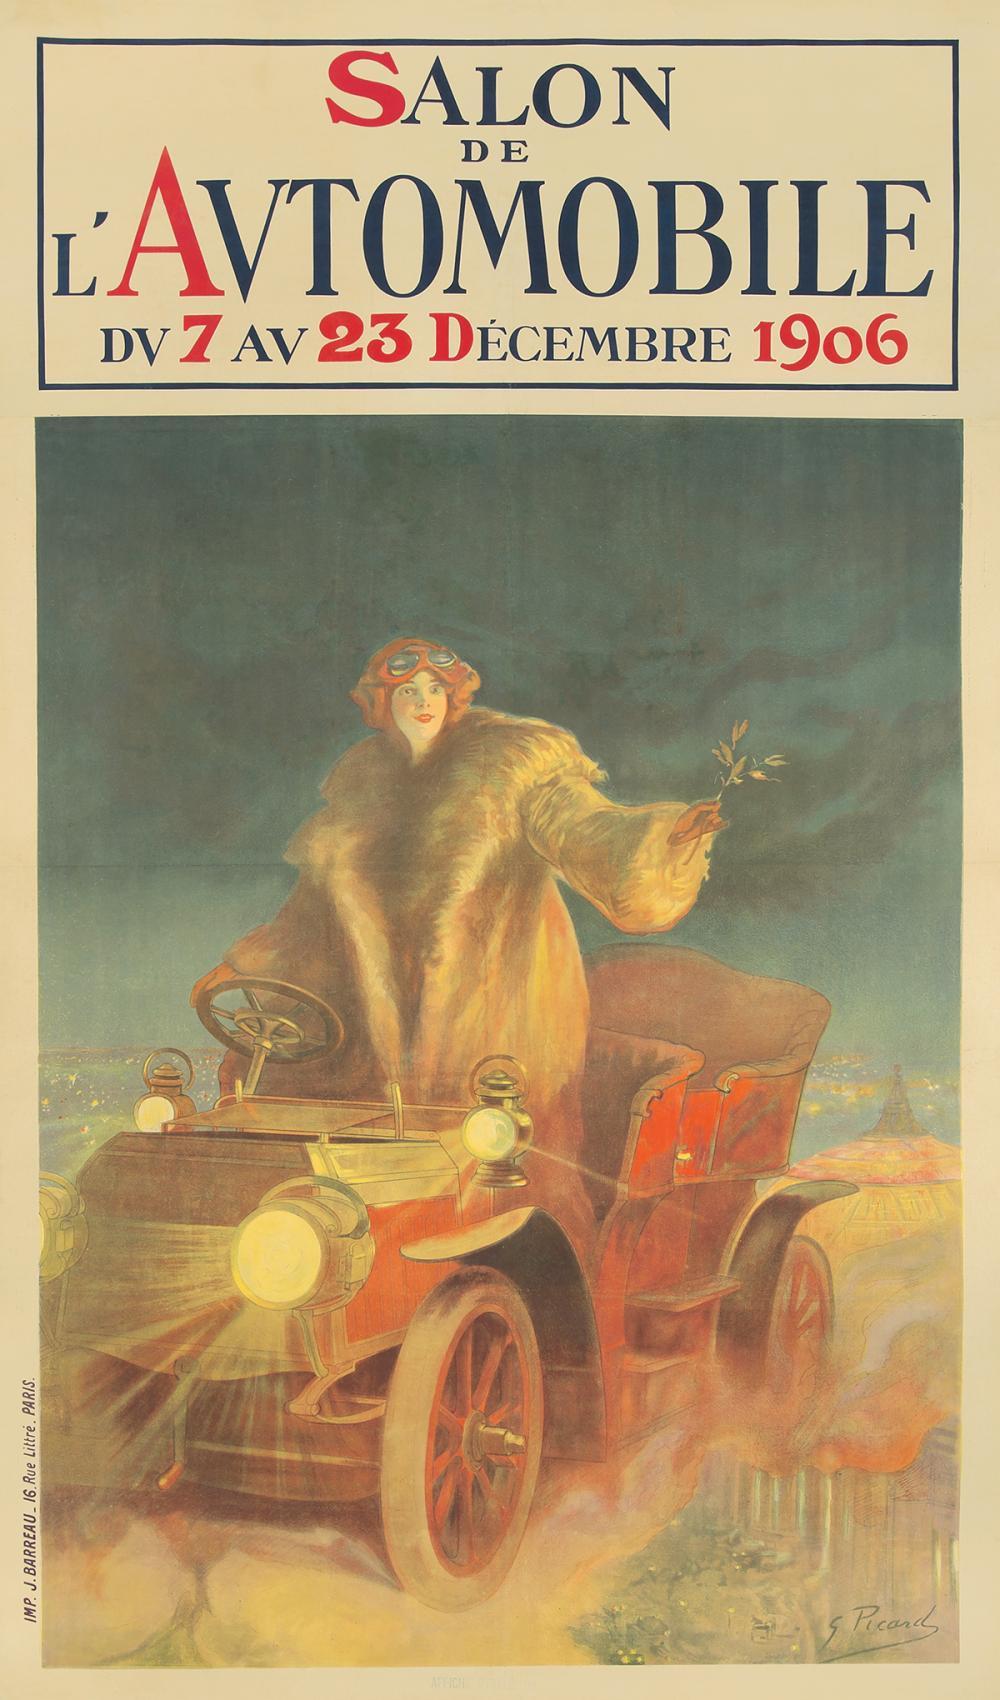 Salon de l'Automobile. 1906.